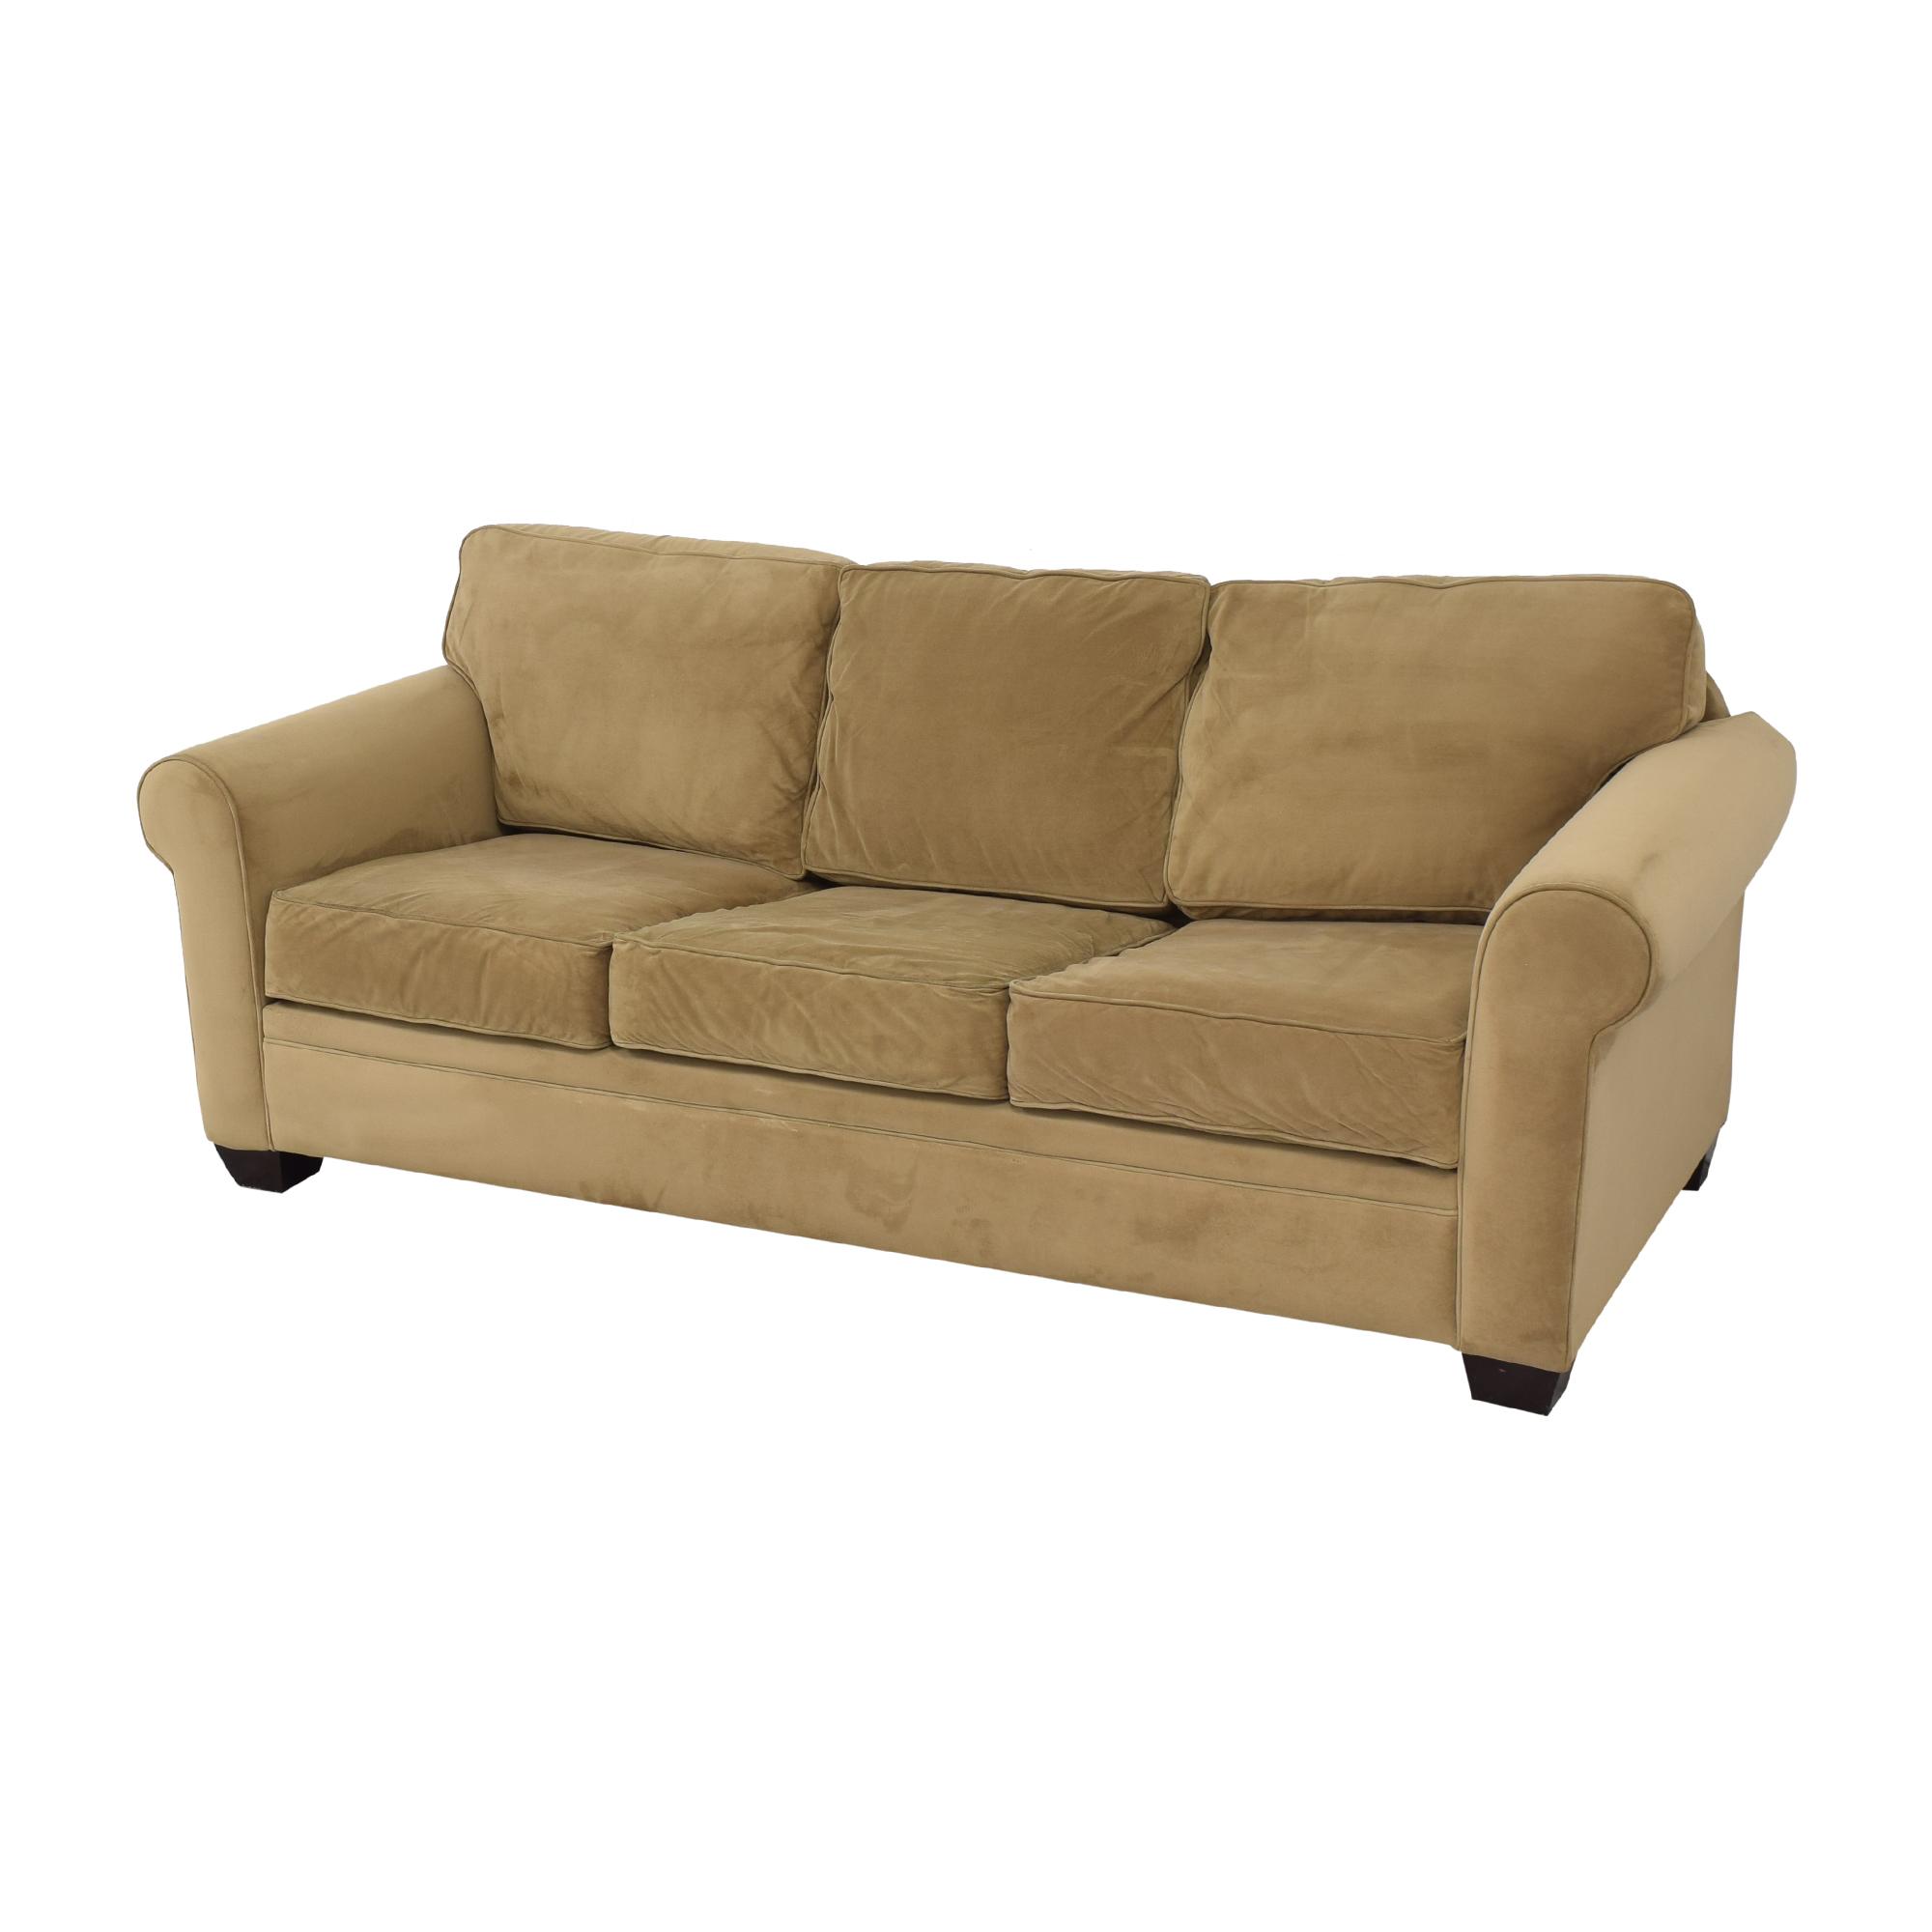 buy Macy's Tan Sofa Bed Macy's